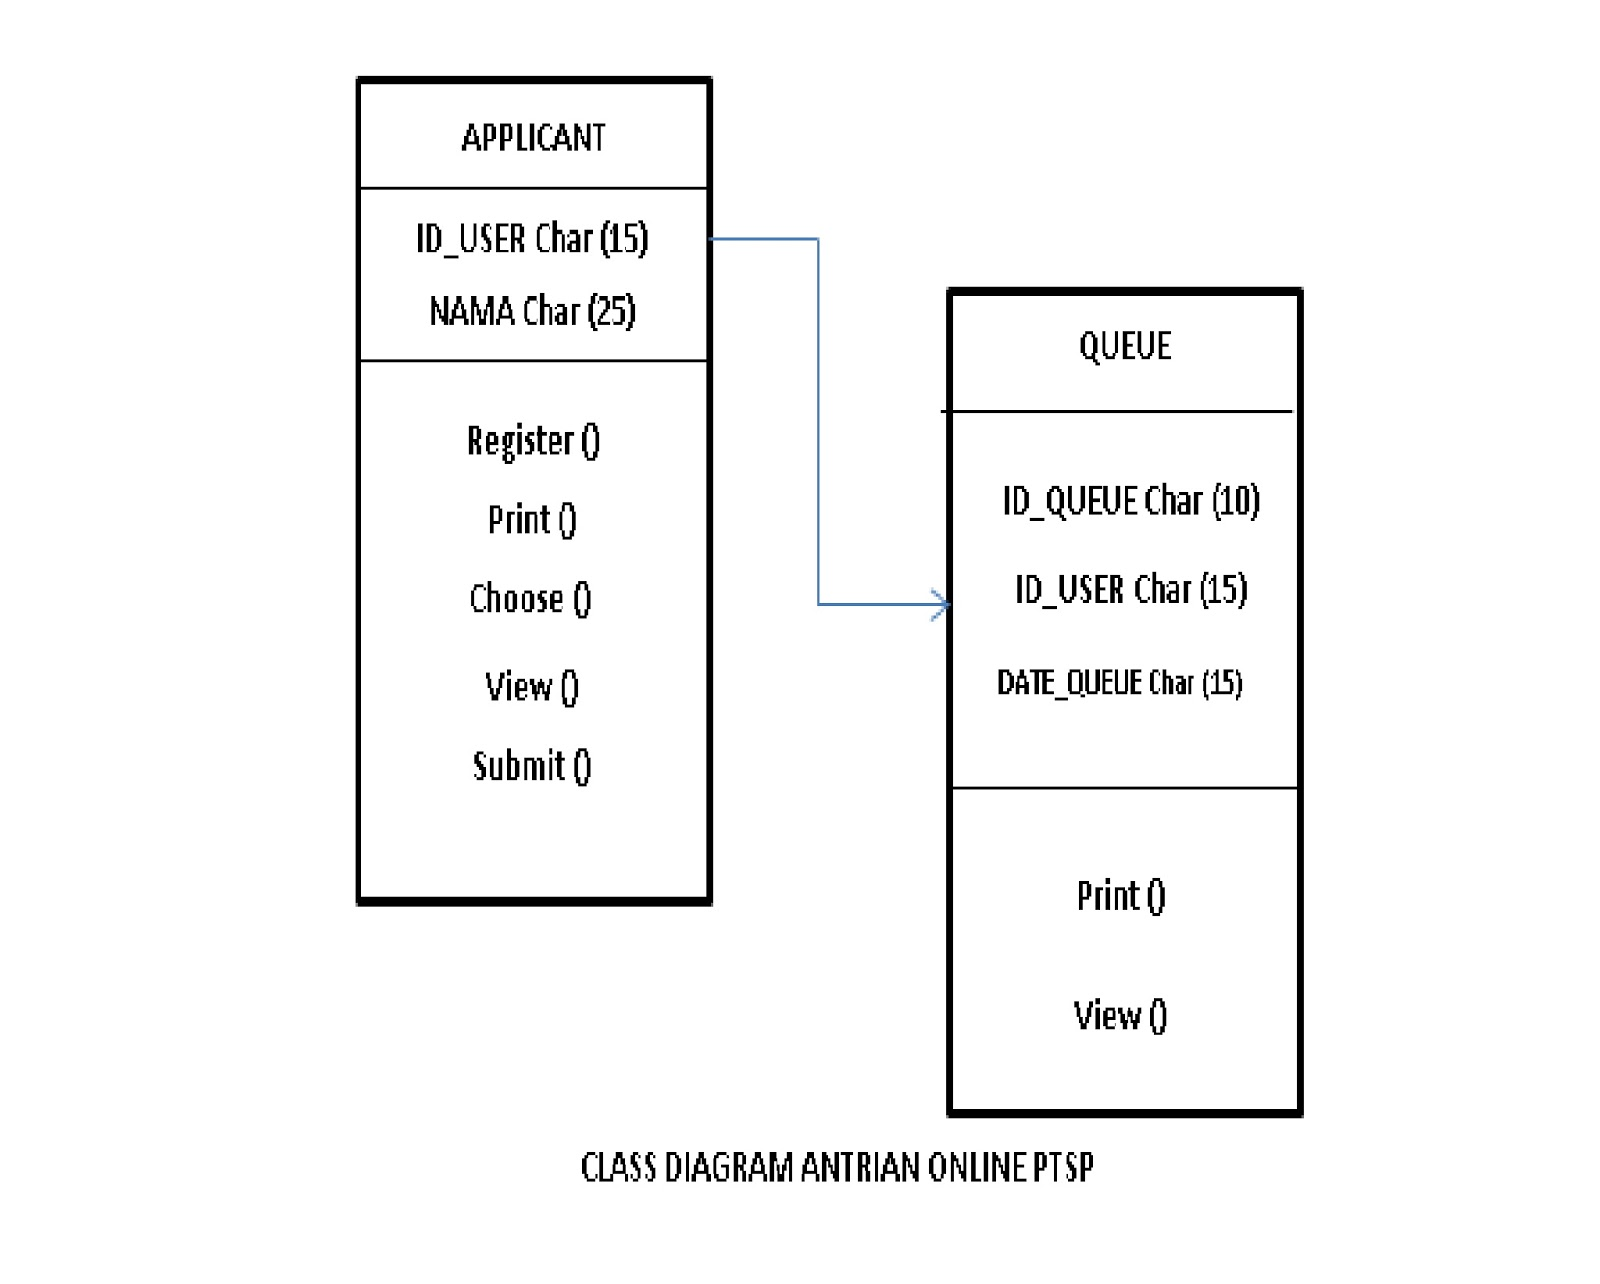 Use case class diagram antrian online bptsp 1 seratanisa gambar 2 class diagram ccuart Image collections